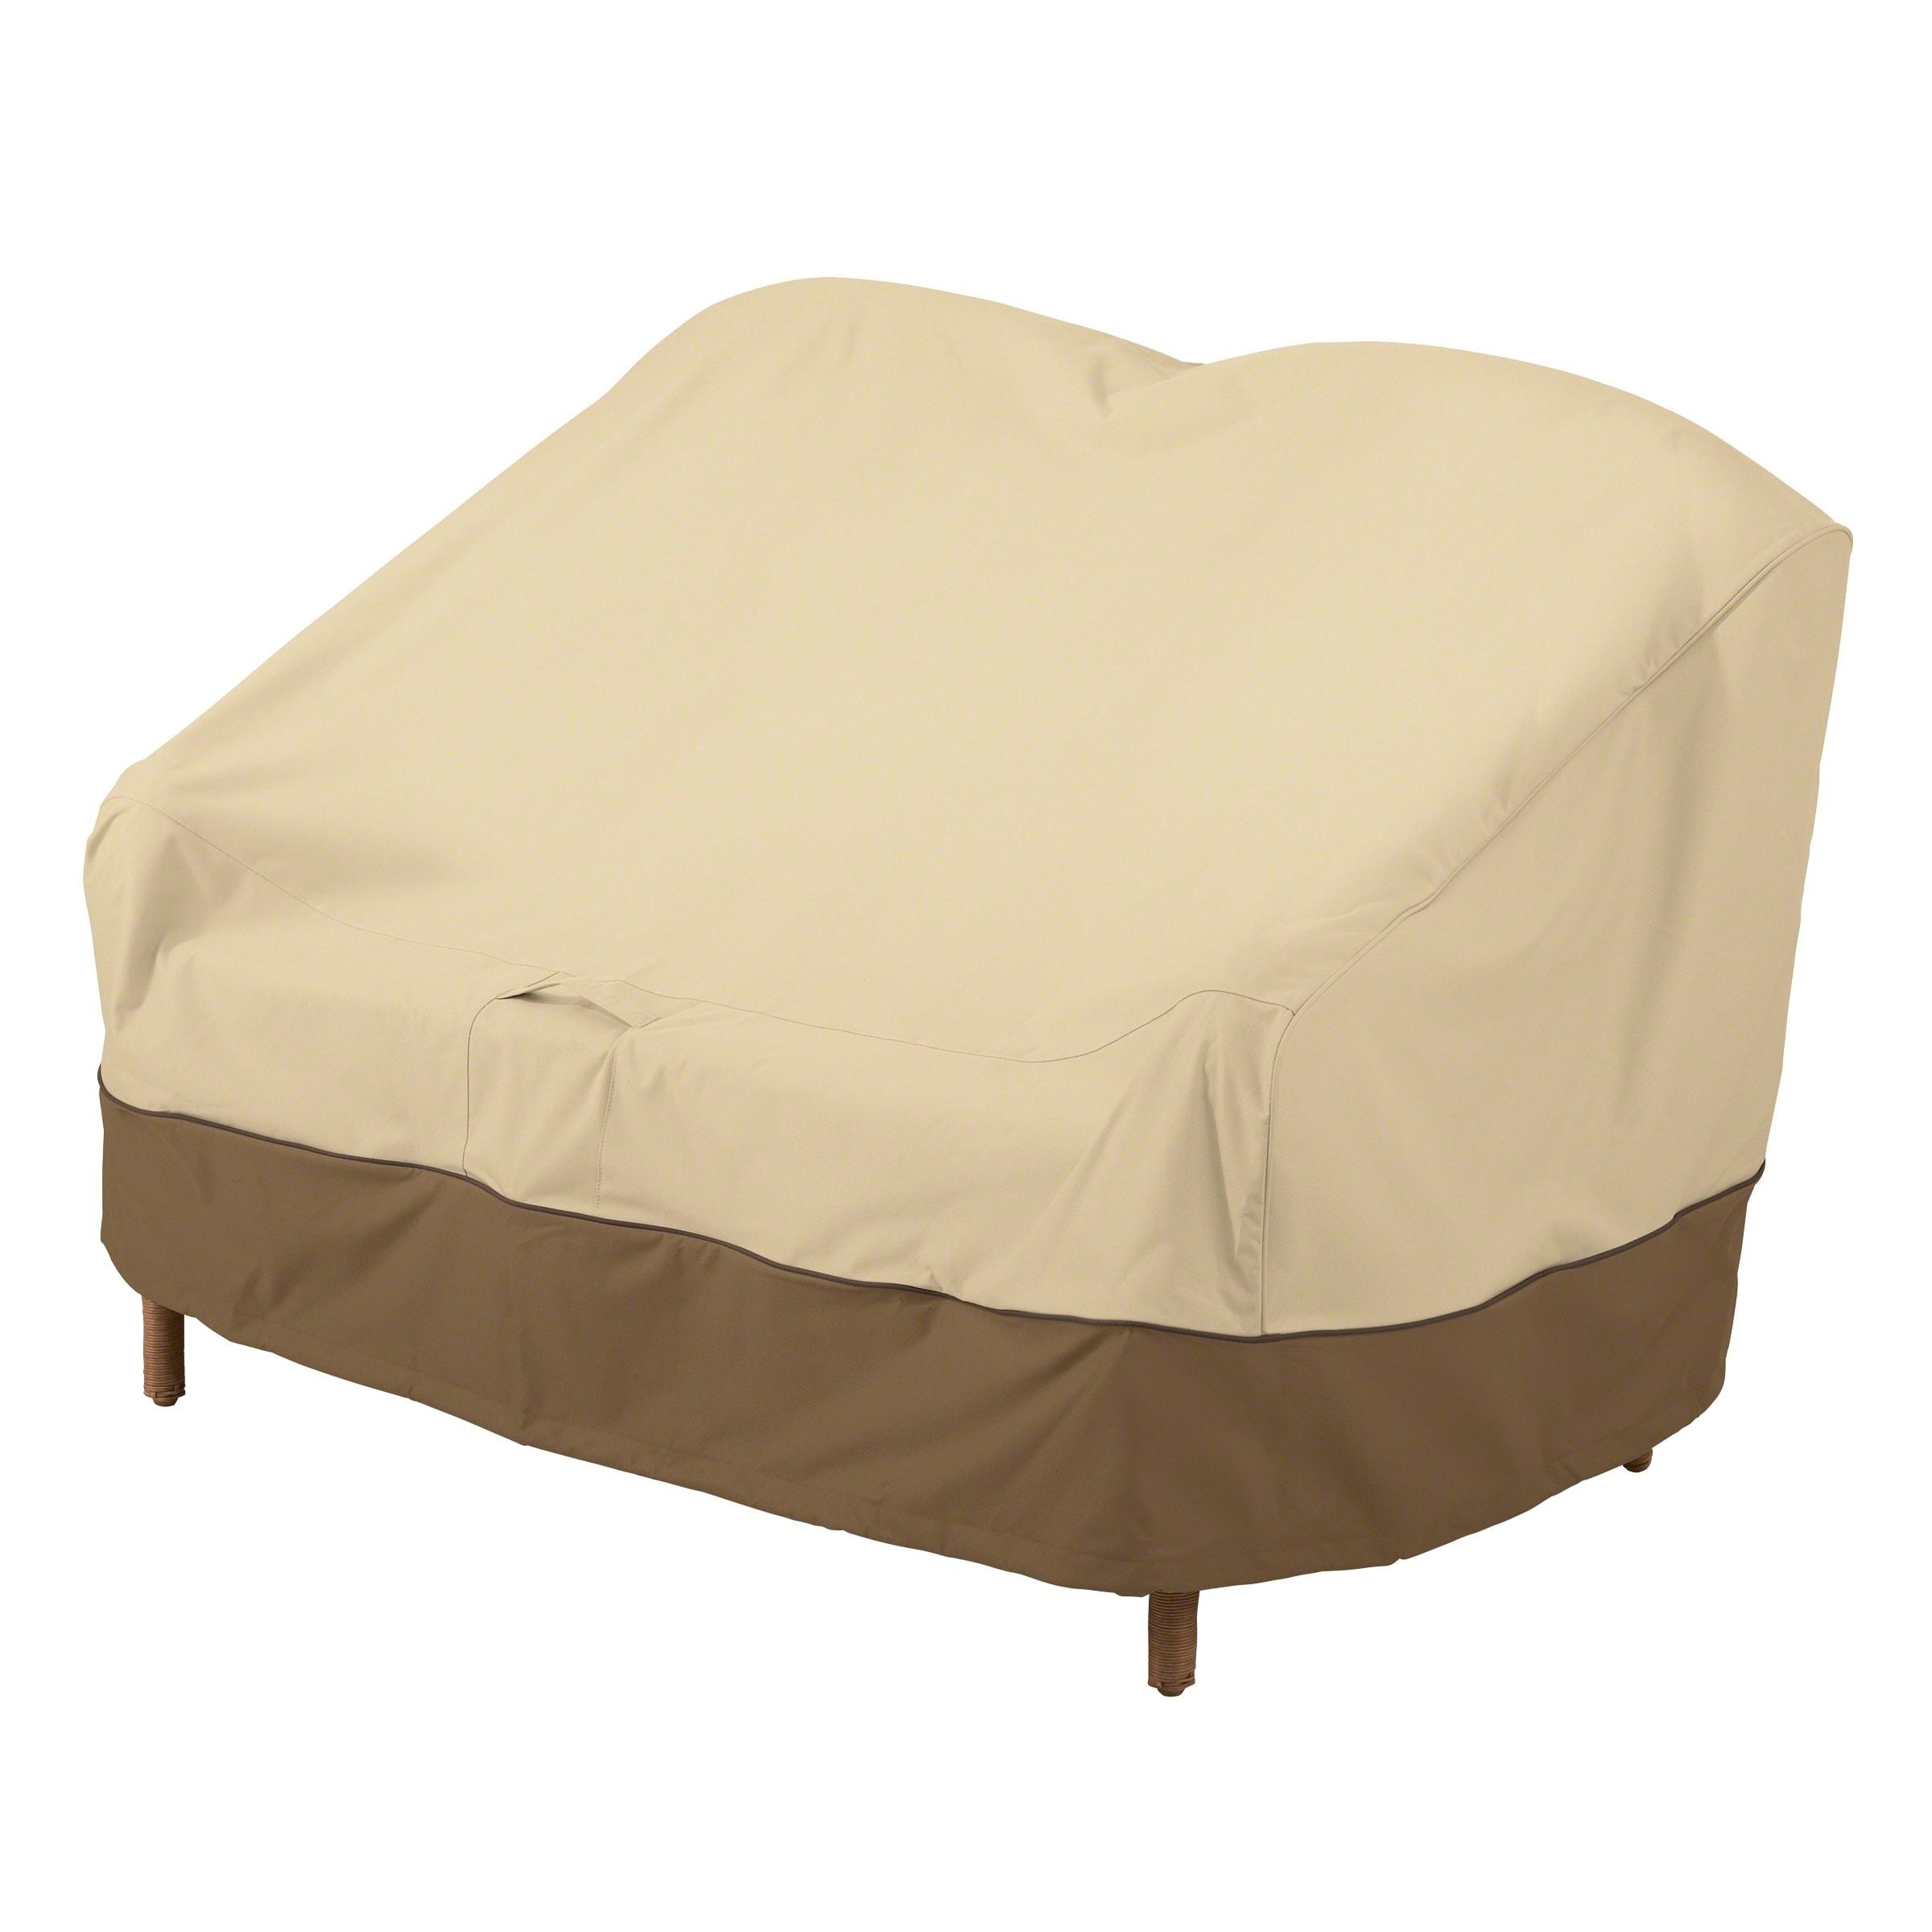 Picture of: Classic Accessories Veranda Adirondack Chair Cover Patio Garden Furniture Yard Garden Outdoor Living